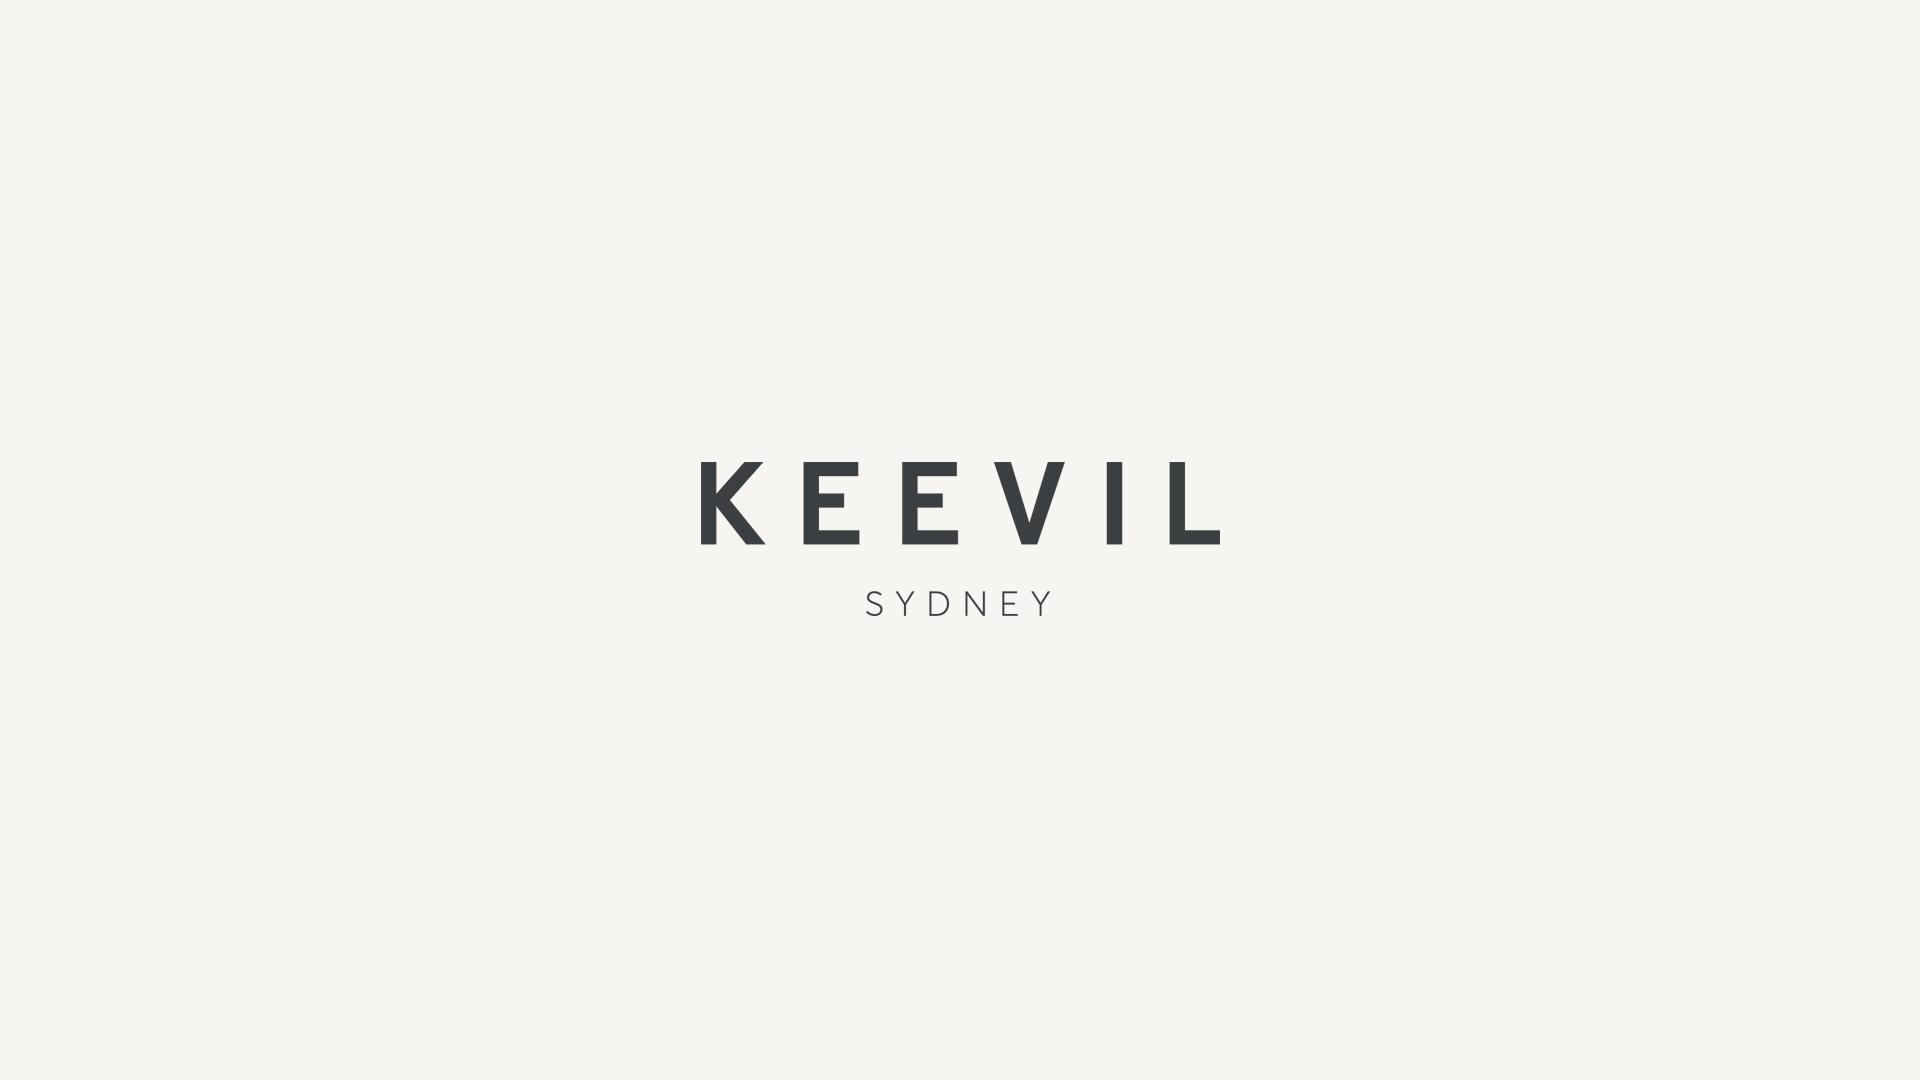 keevil.psdArtboard 1 copy 4_2.jpg